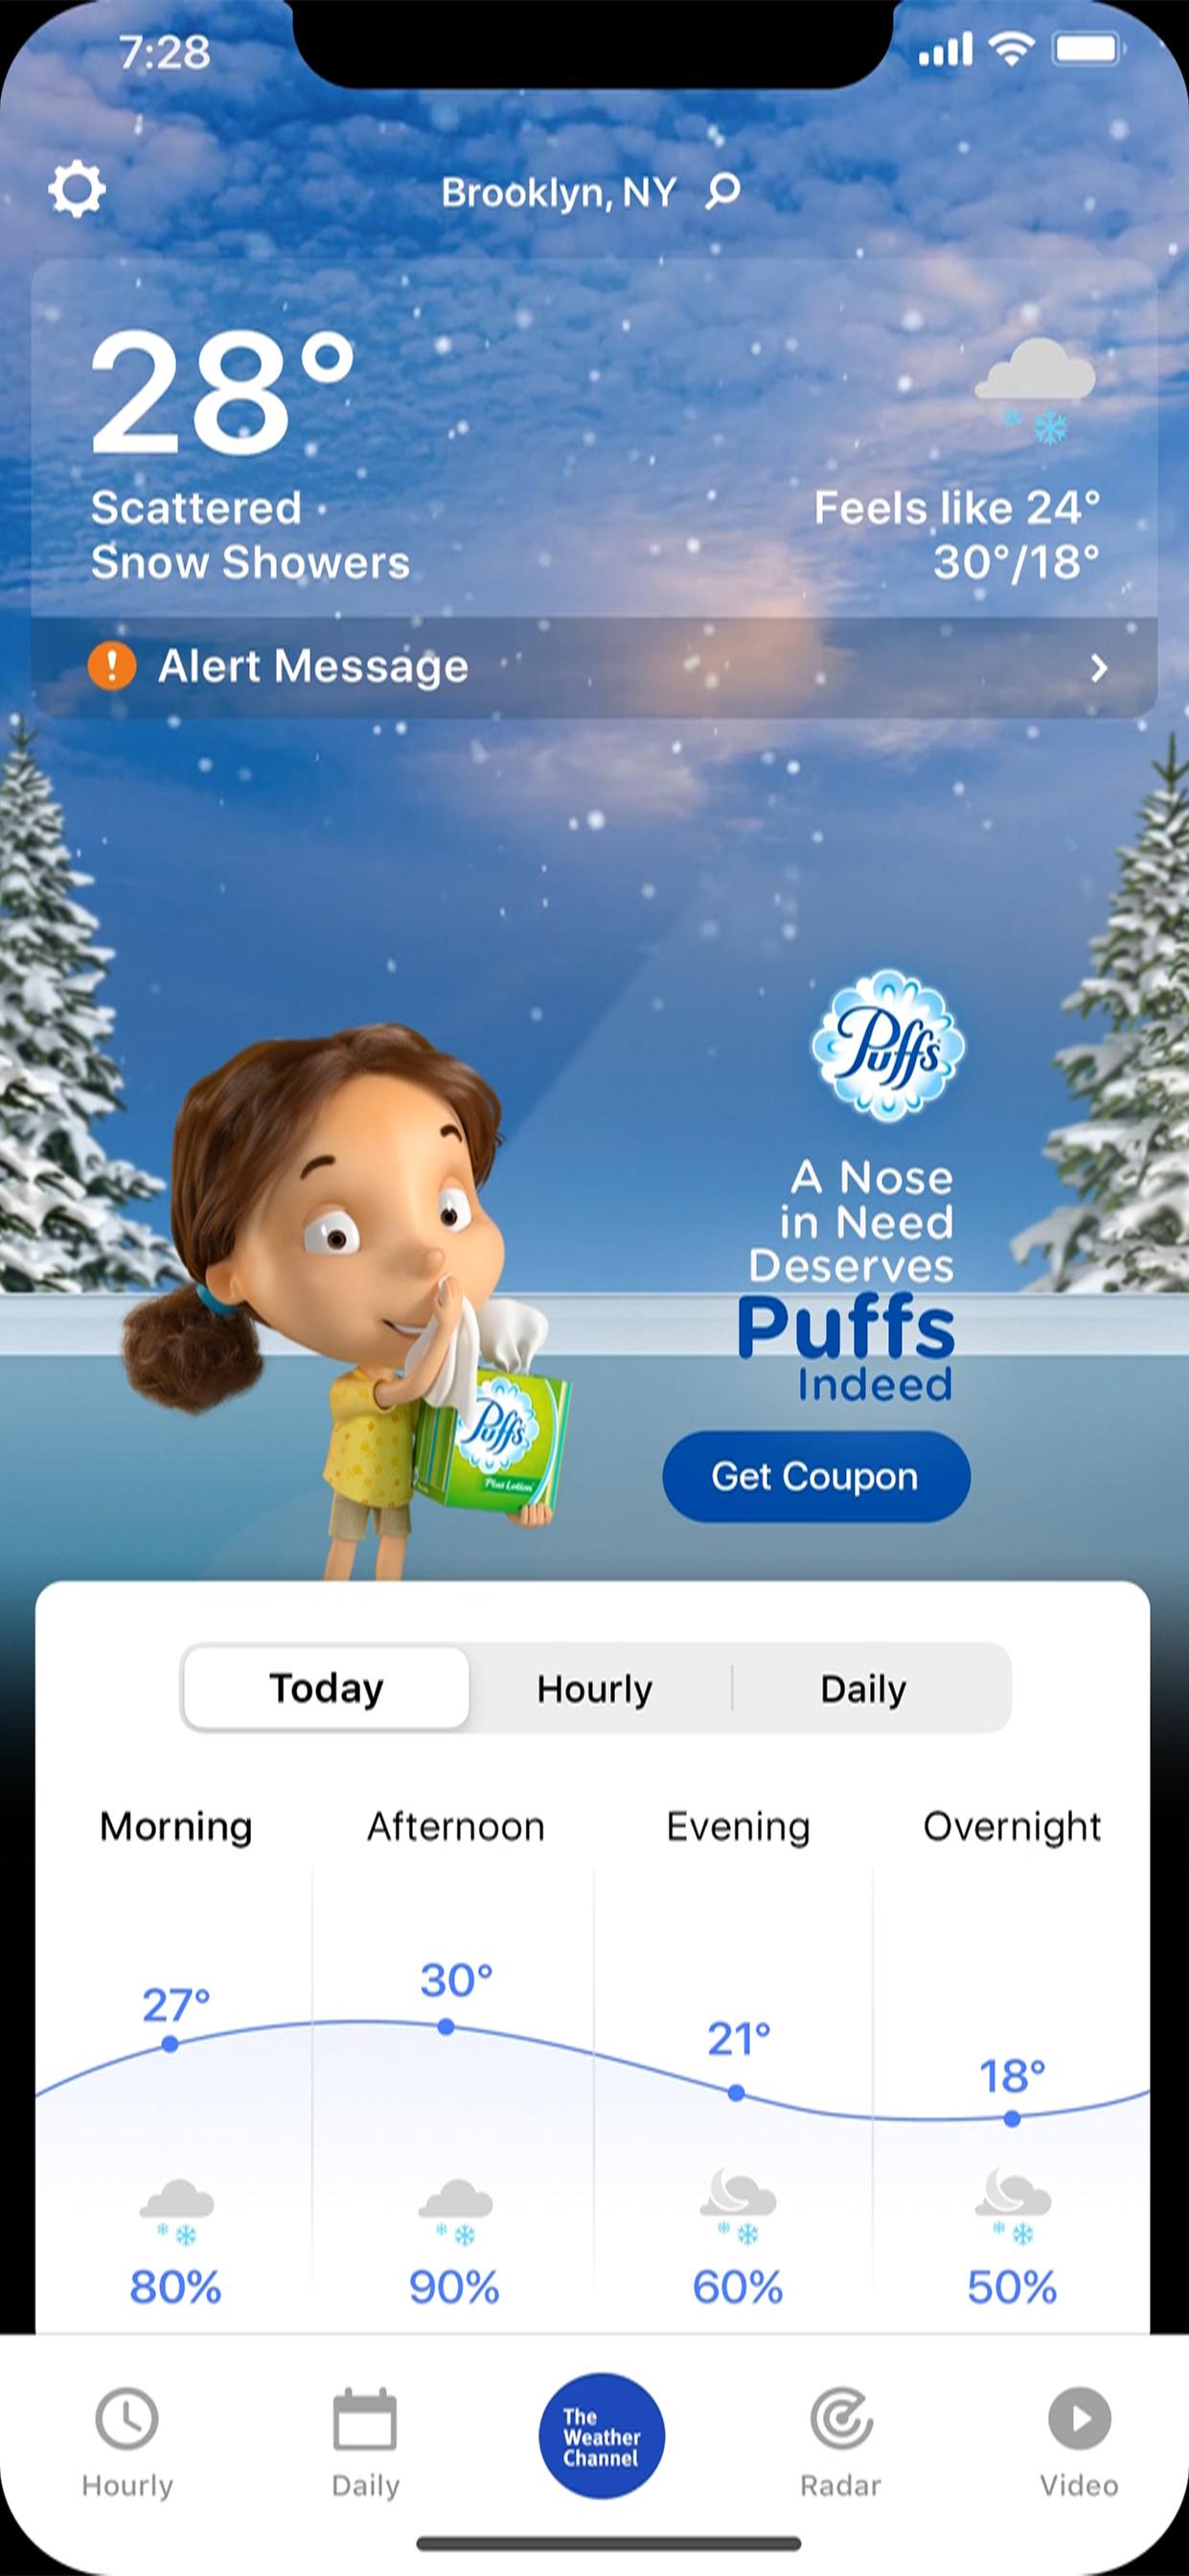 Puffs_Mobile_App_IM_Transition_r2